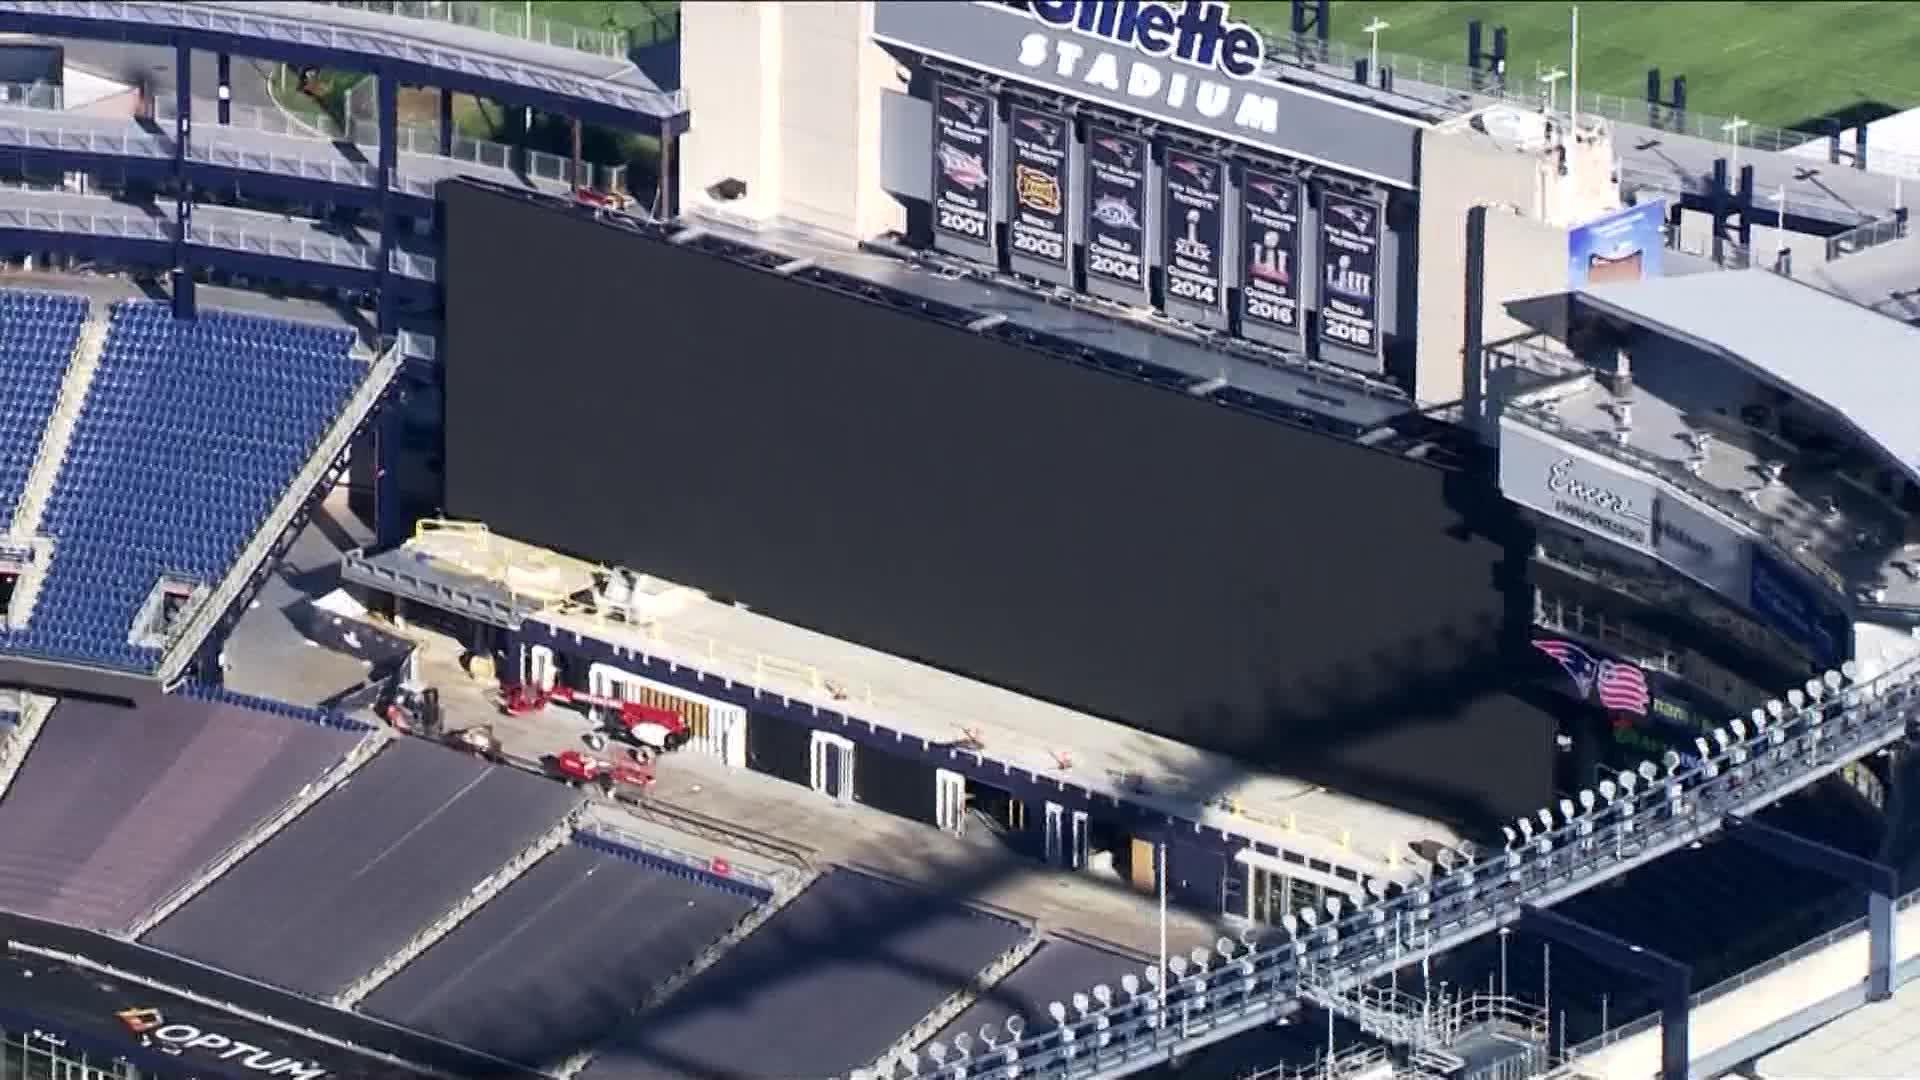 Massive new big screen being installed inside Gillette Stadium